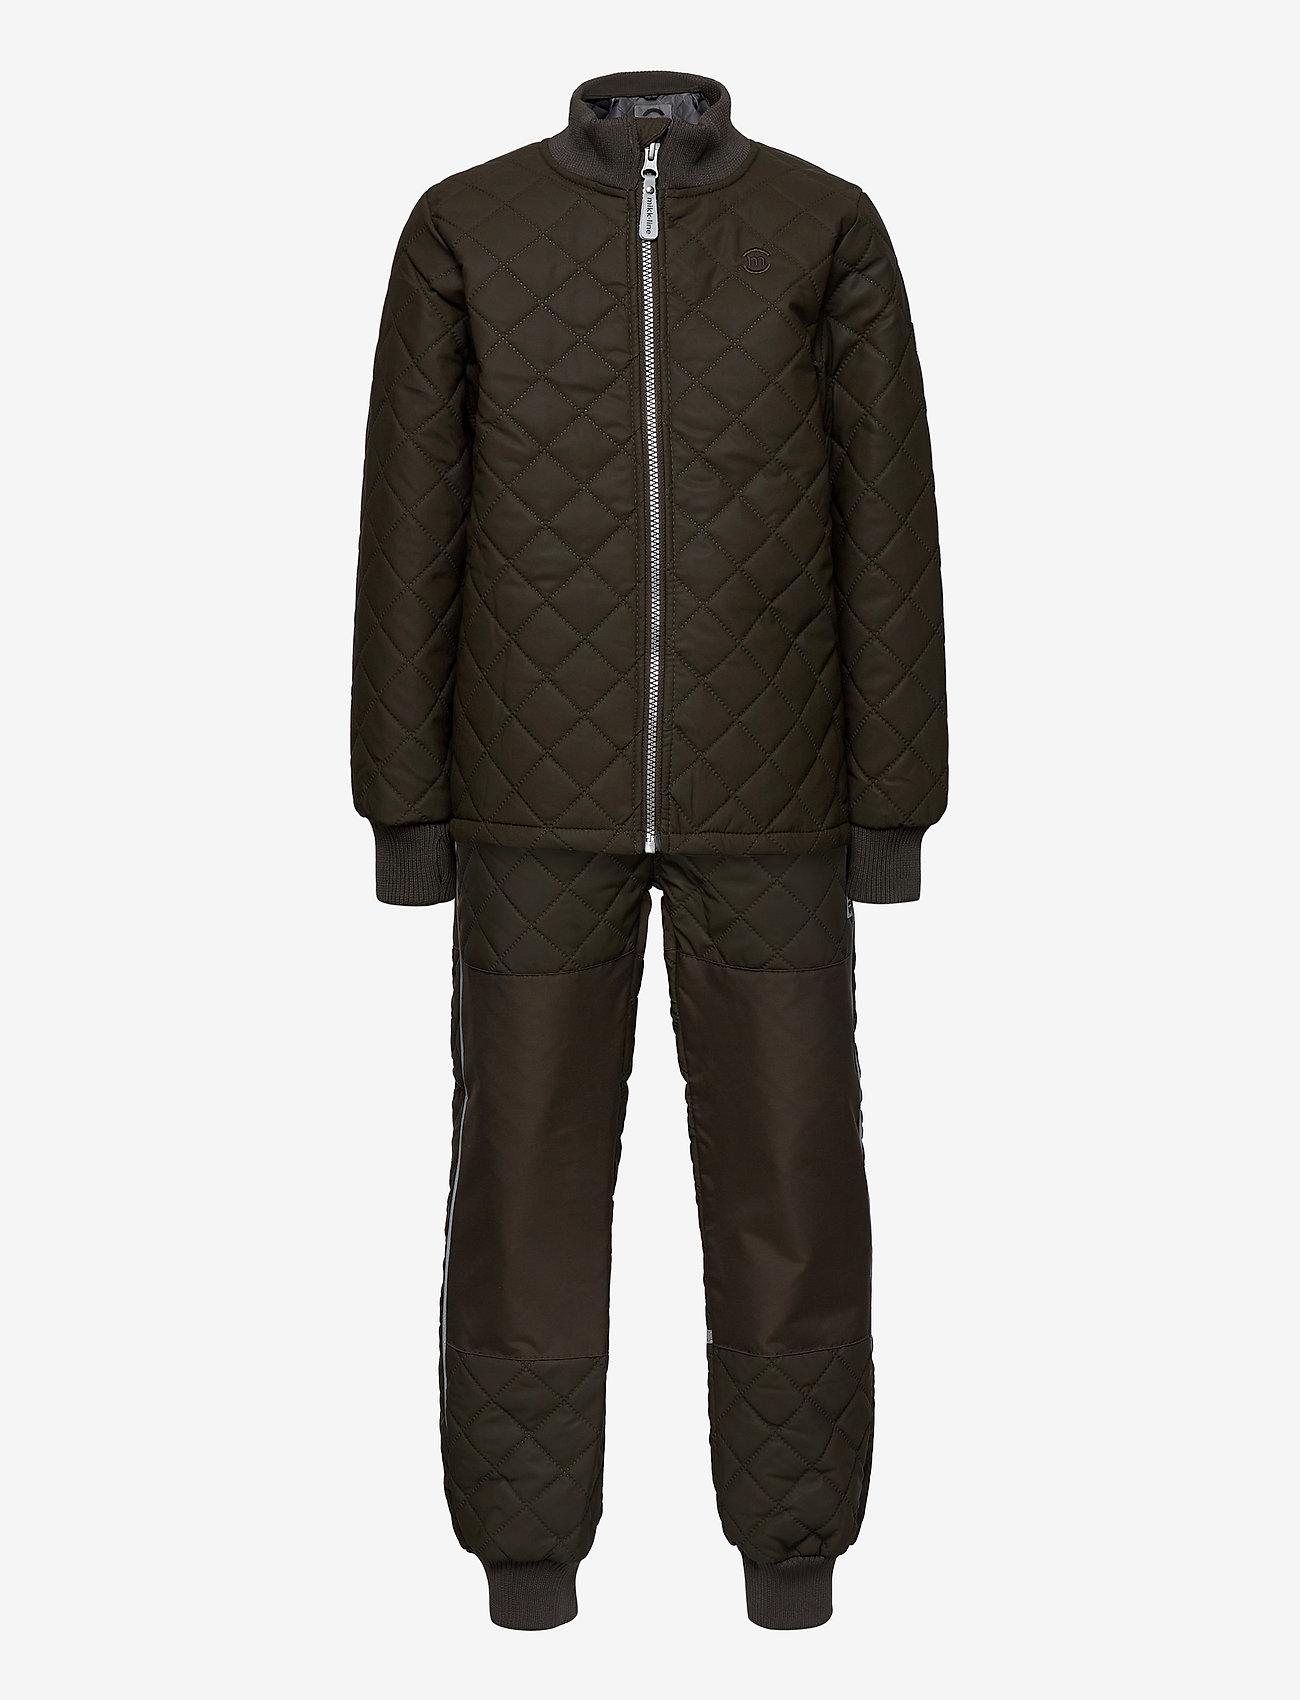 Mikk-Line - Duvet Set - No Fleece - termotøj - black olive - 0